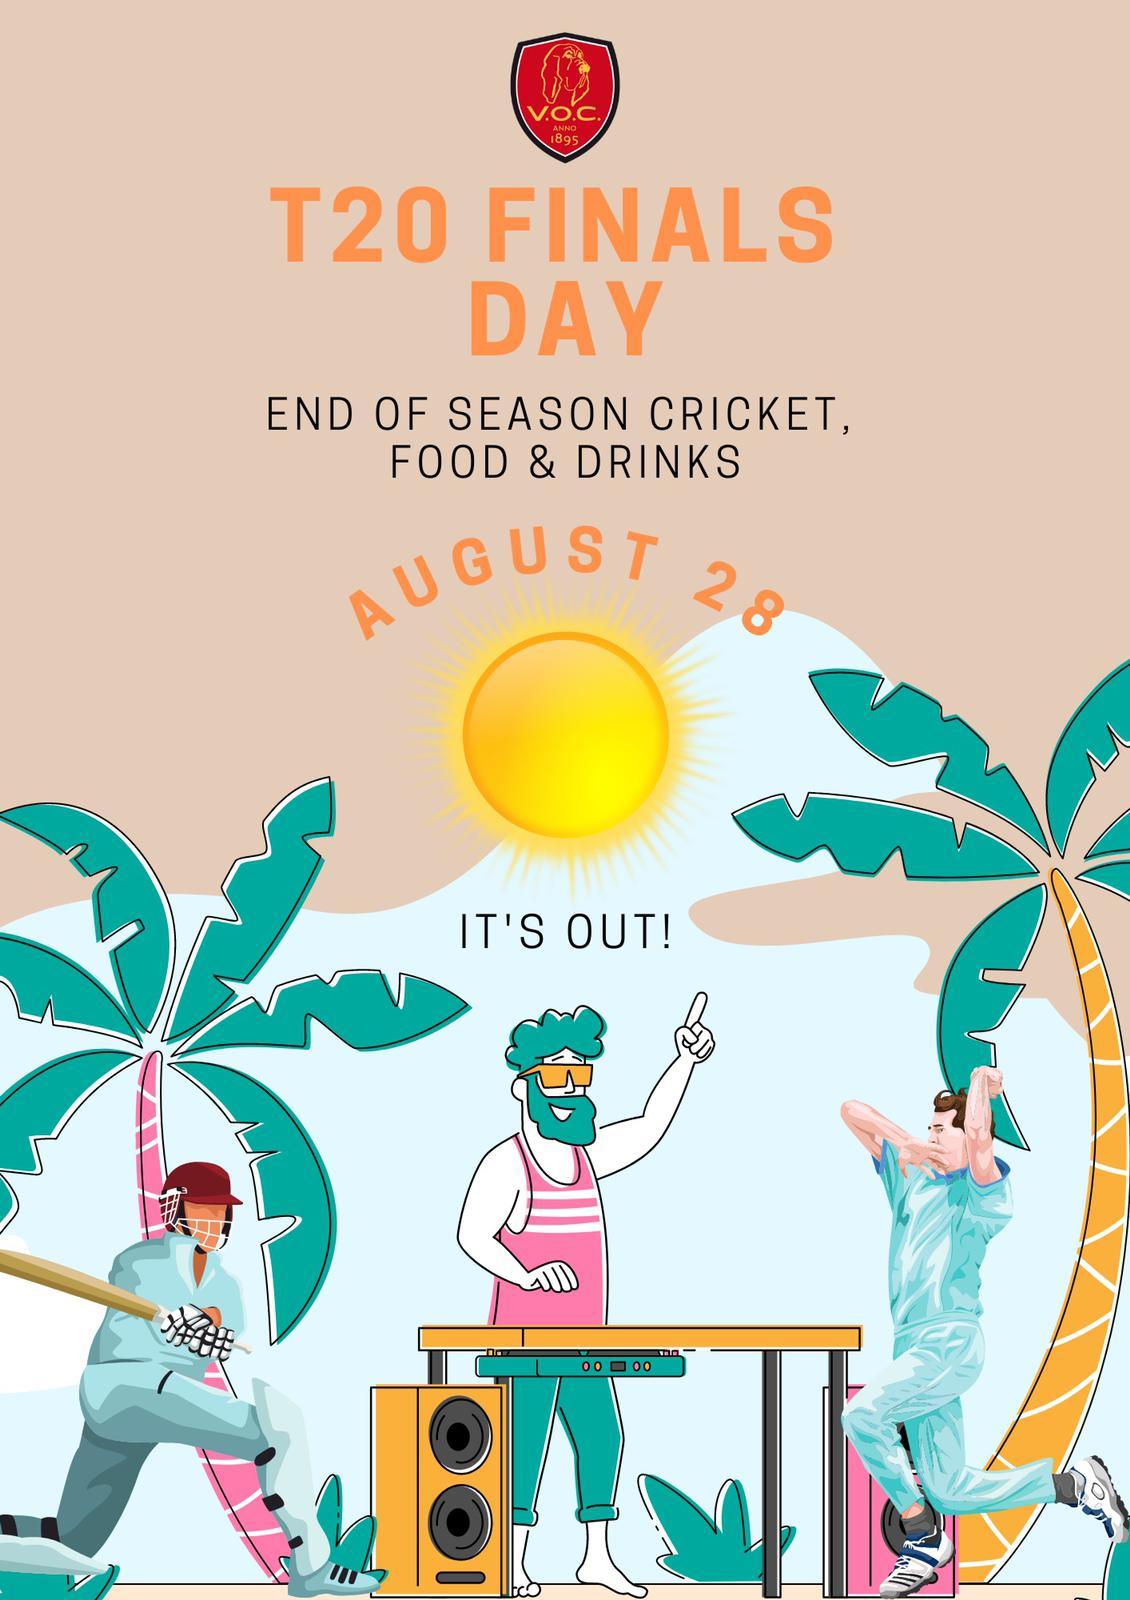 T20 Finaledag op V.O.C. zaterdag 28 augustus